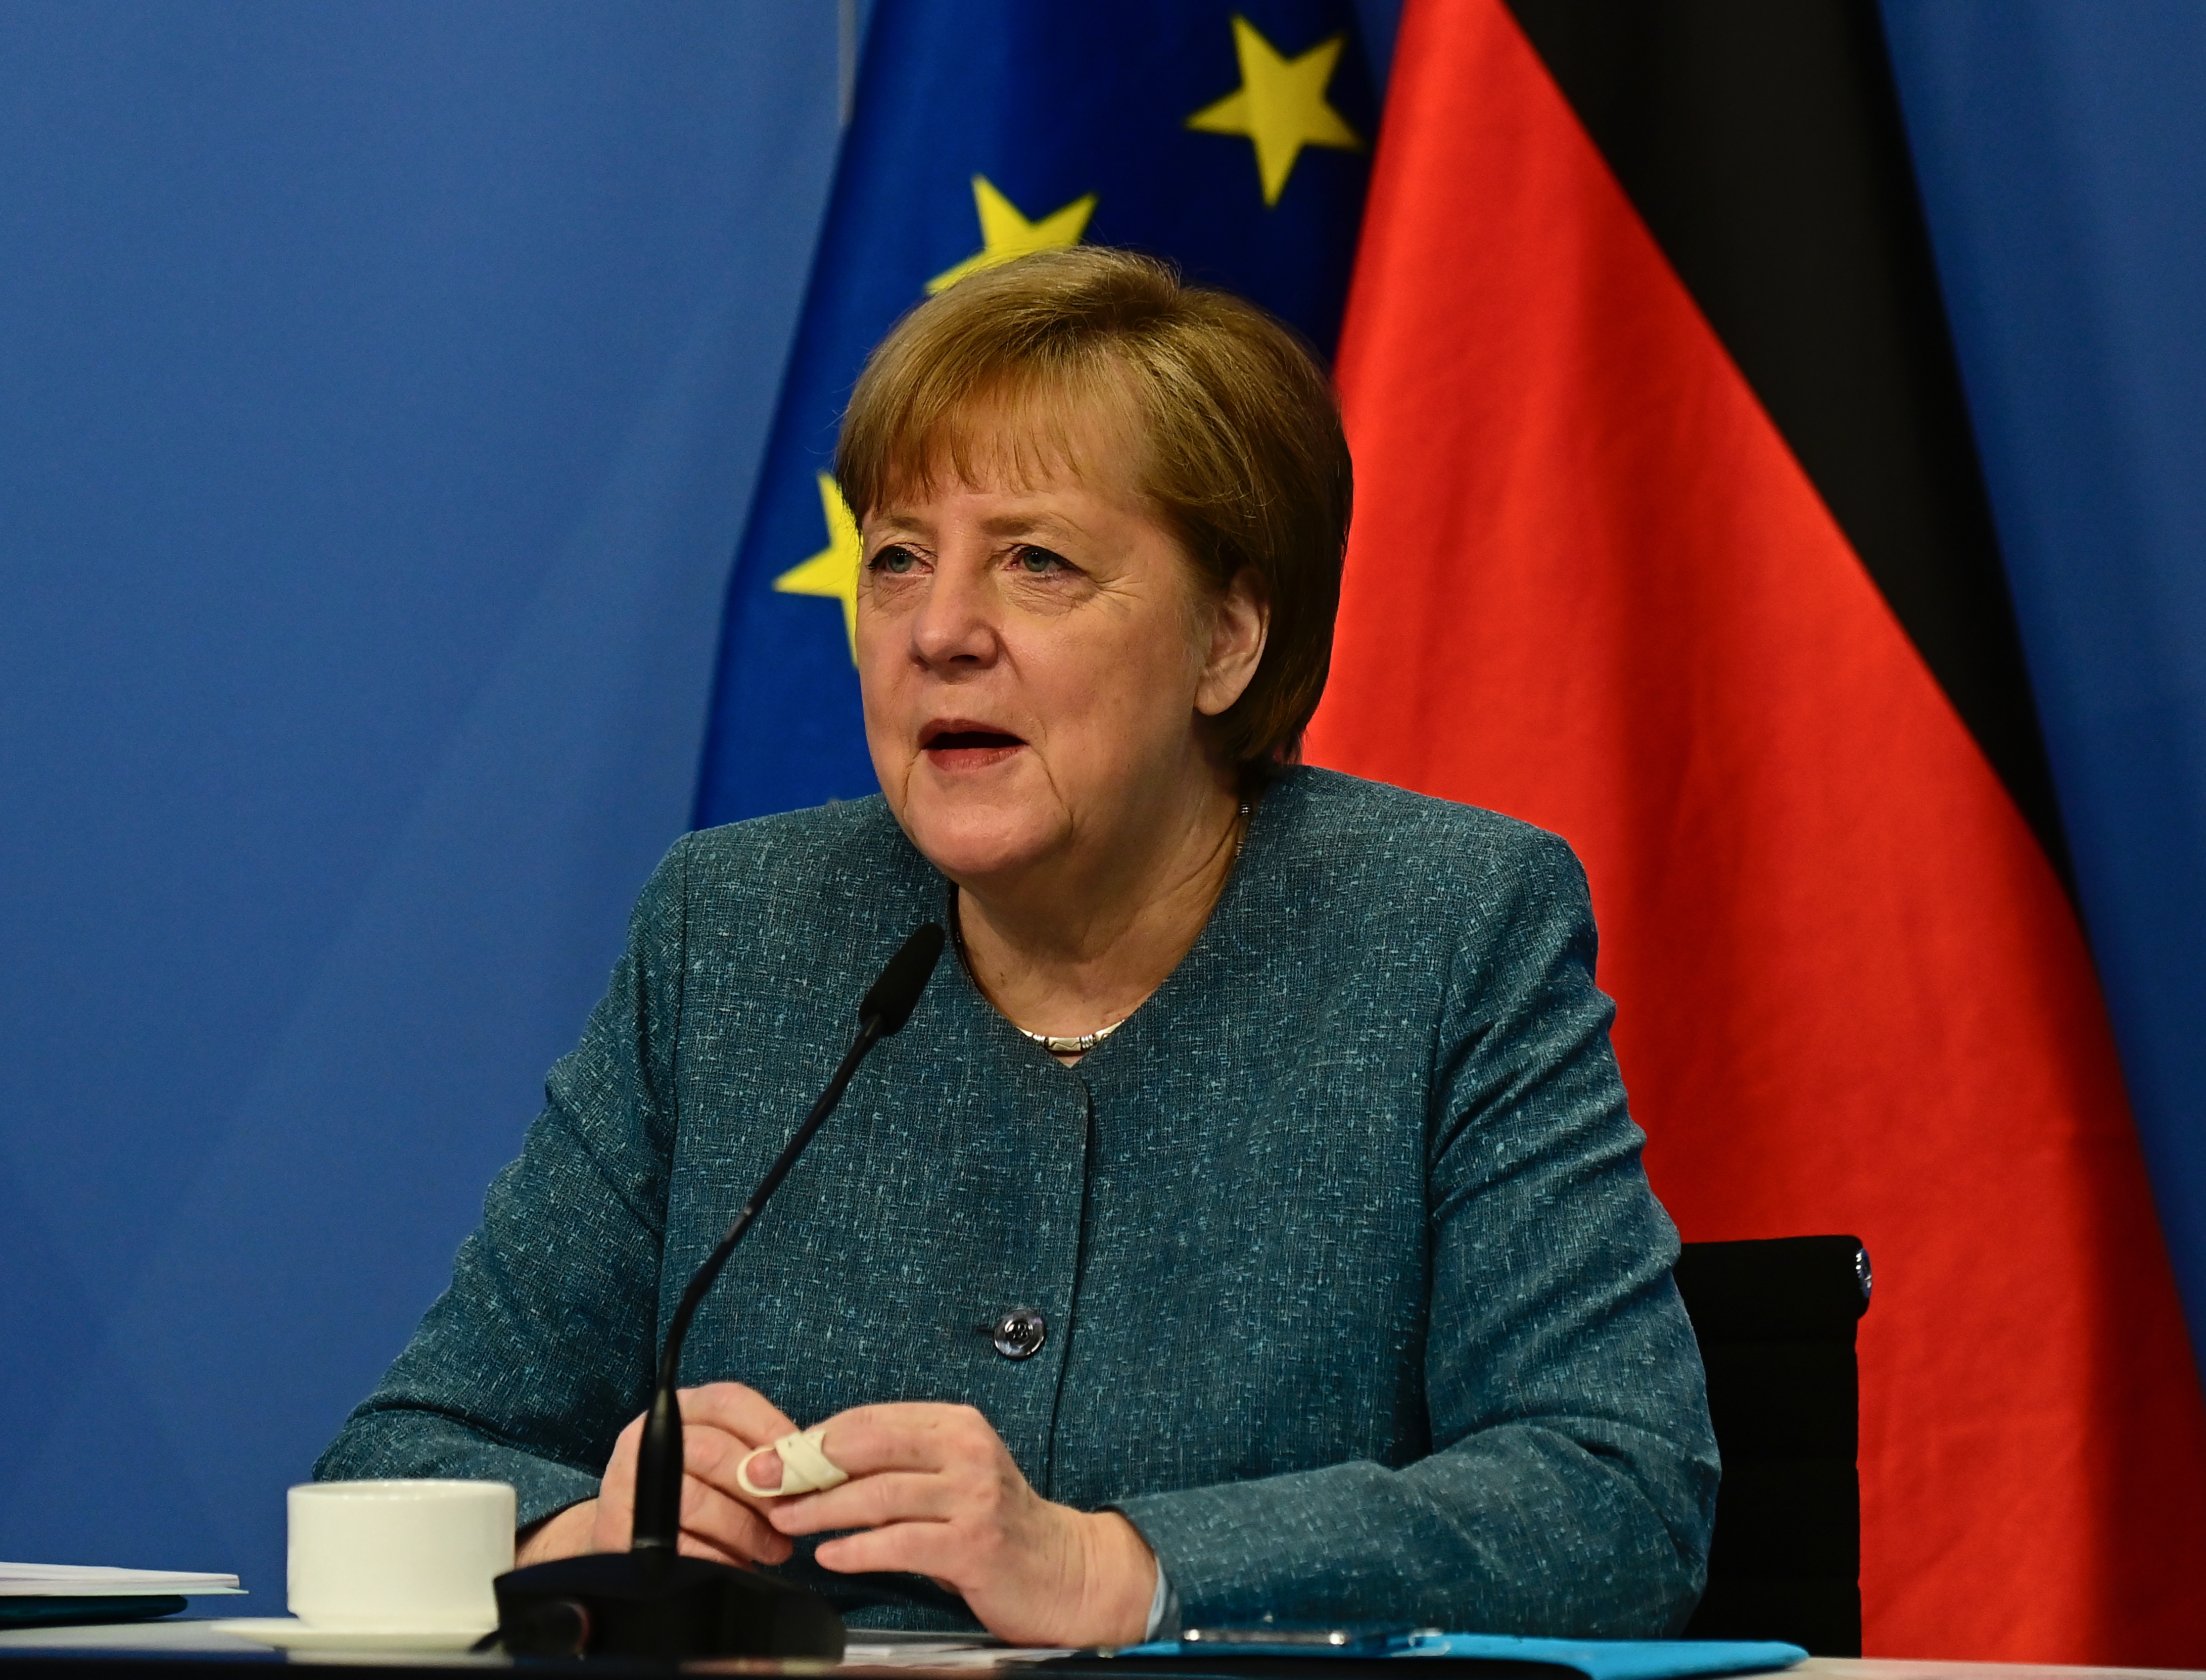 German Chancellor Angela Merkel has spoken out against this mechanism.